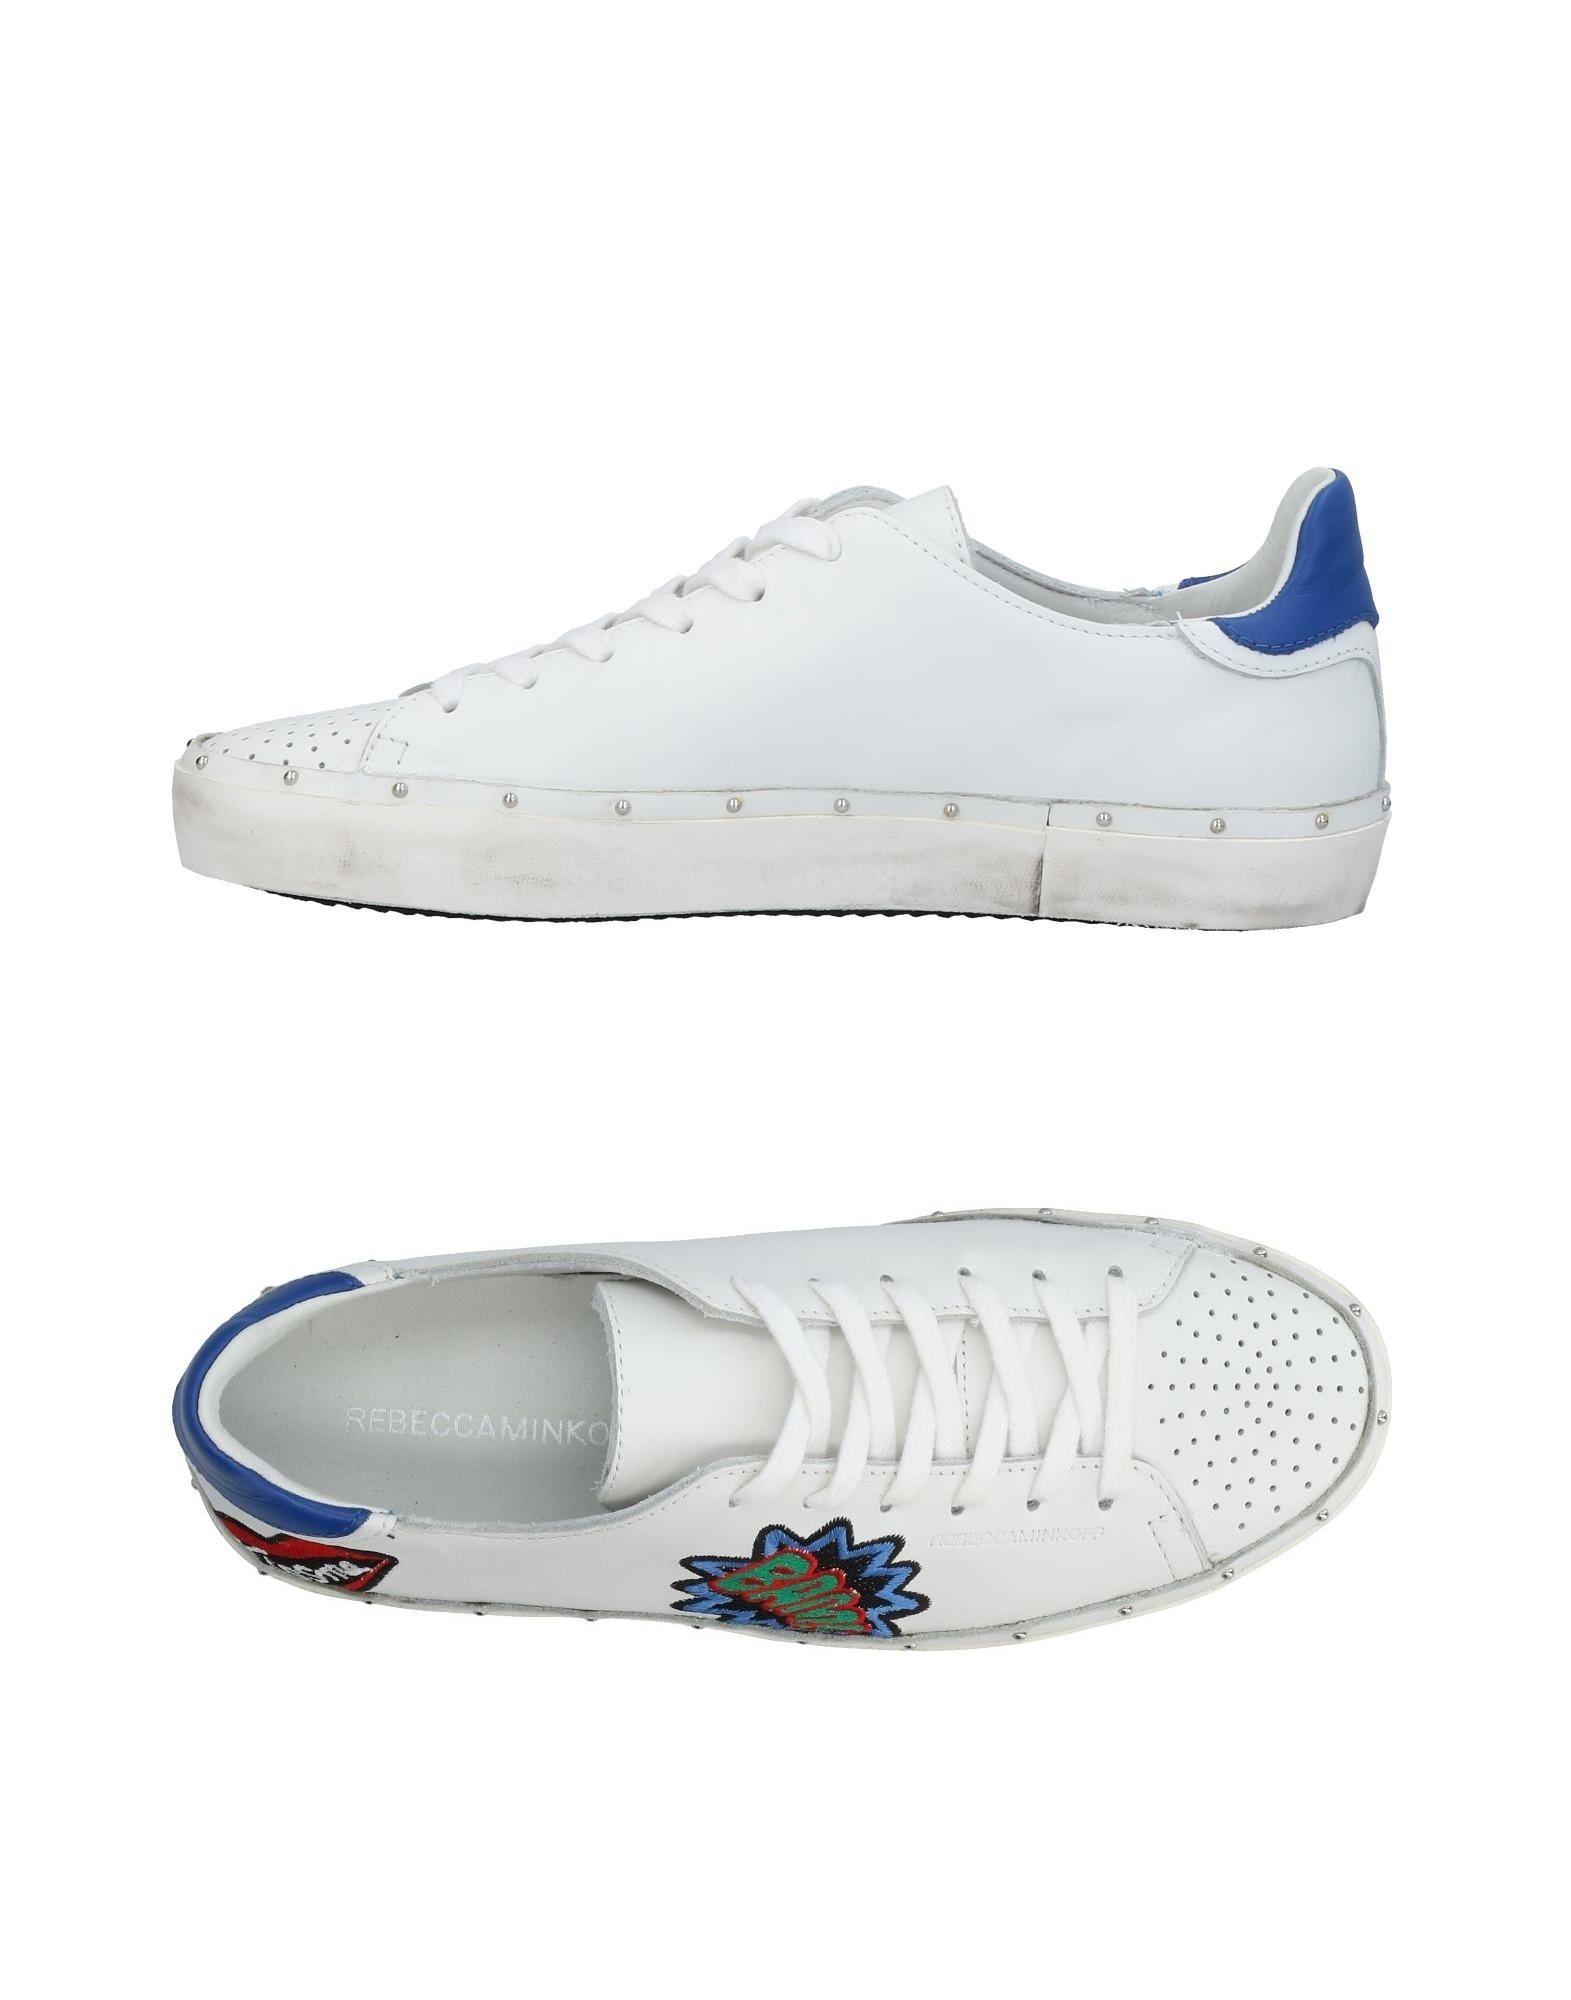 Rebecca Minkoff Sneakers Qualität Damen  11448255XB Gute Qualität Sneakers beliebte Schuhe 32fdfa